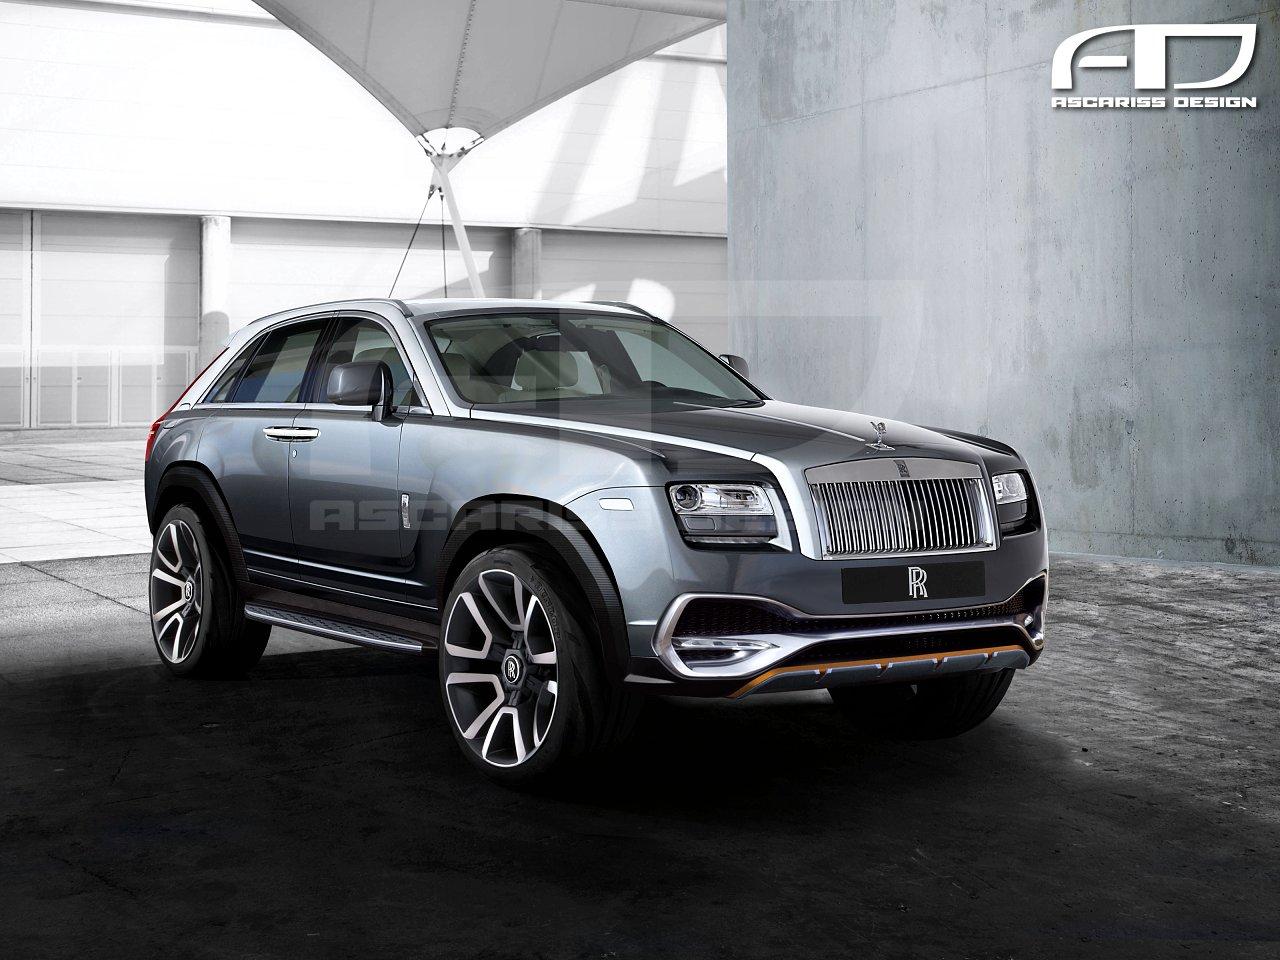 Rolls Royce SUV Version 3 (Cullinan)